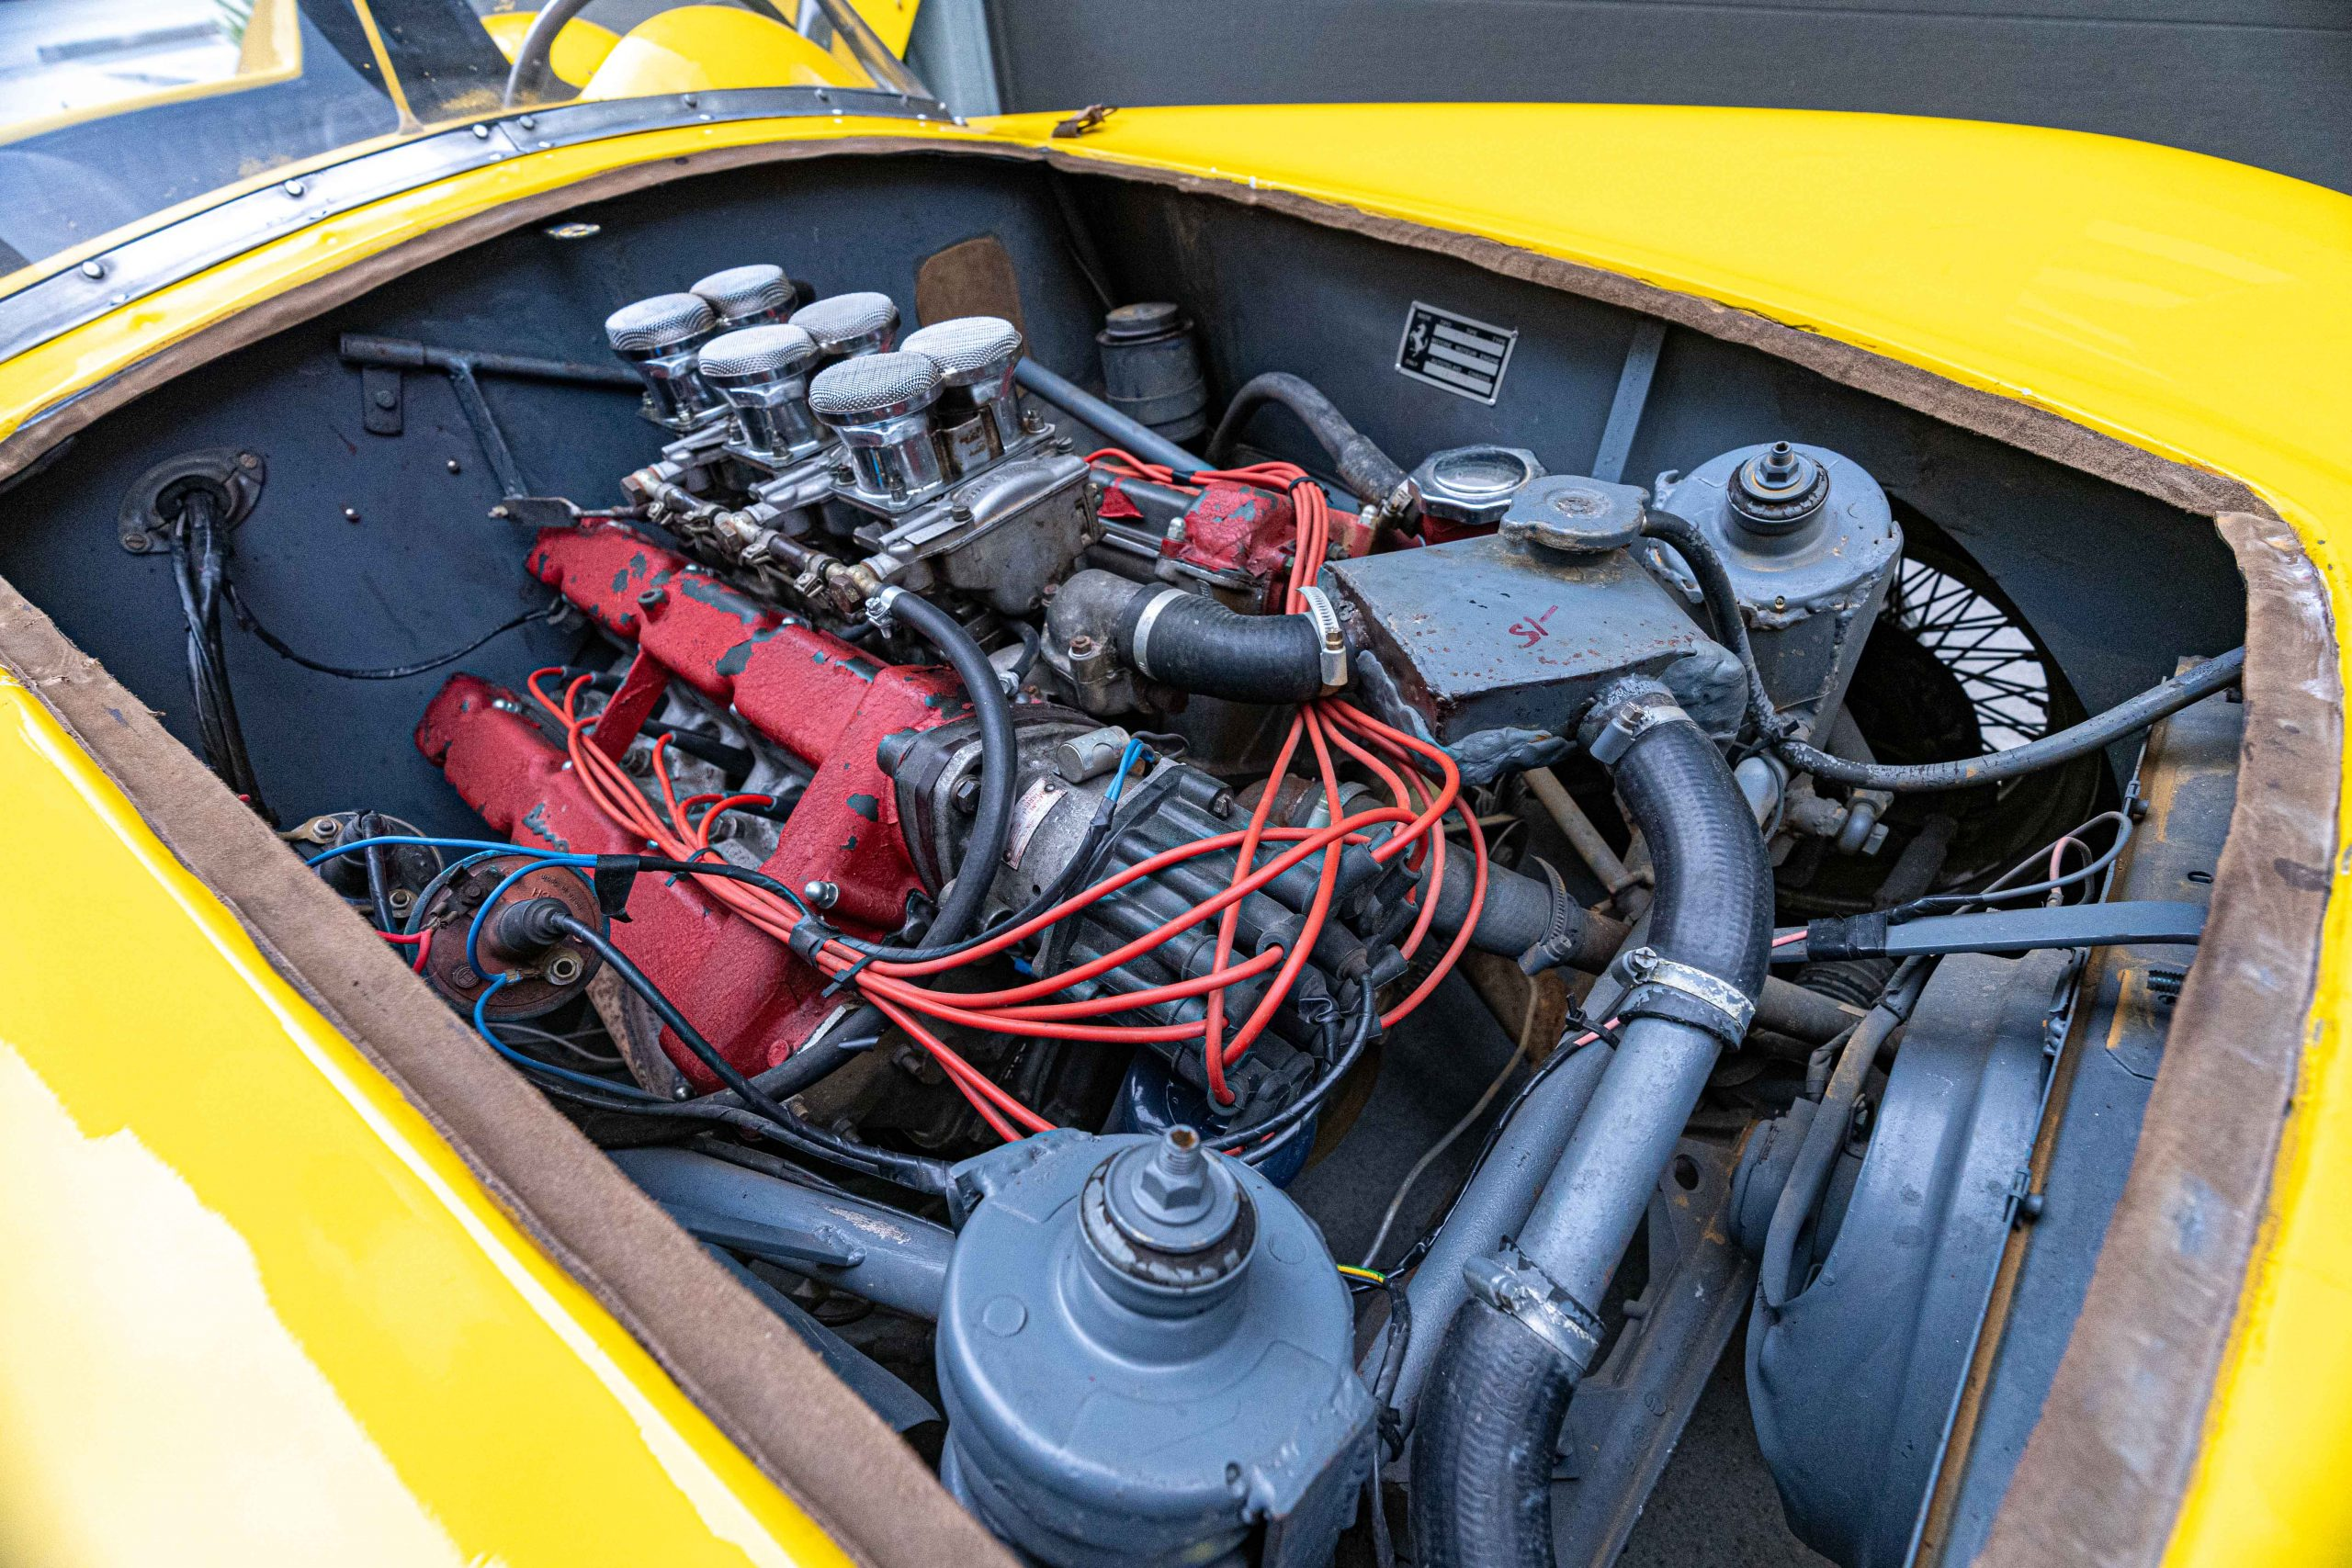 1957 Ferrari 196 SP Engine passenger front view